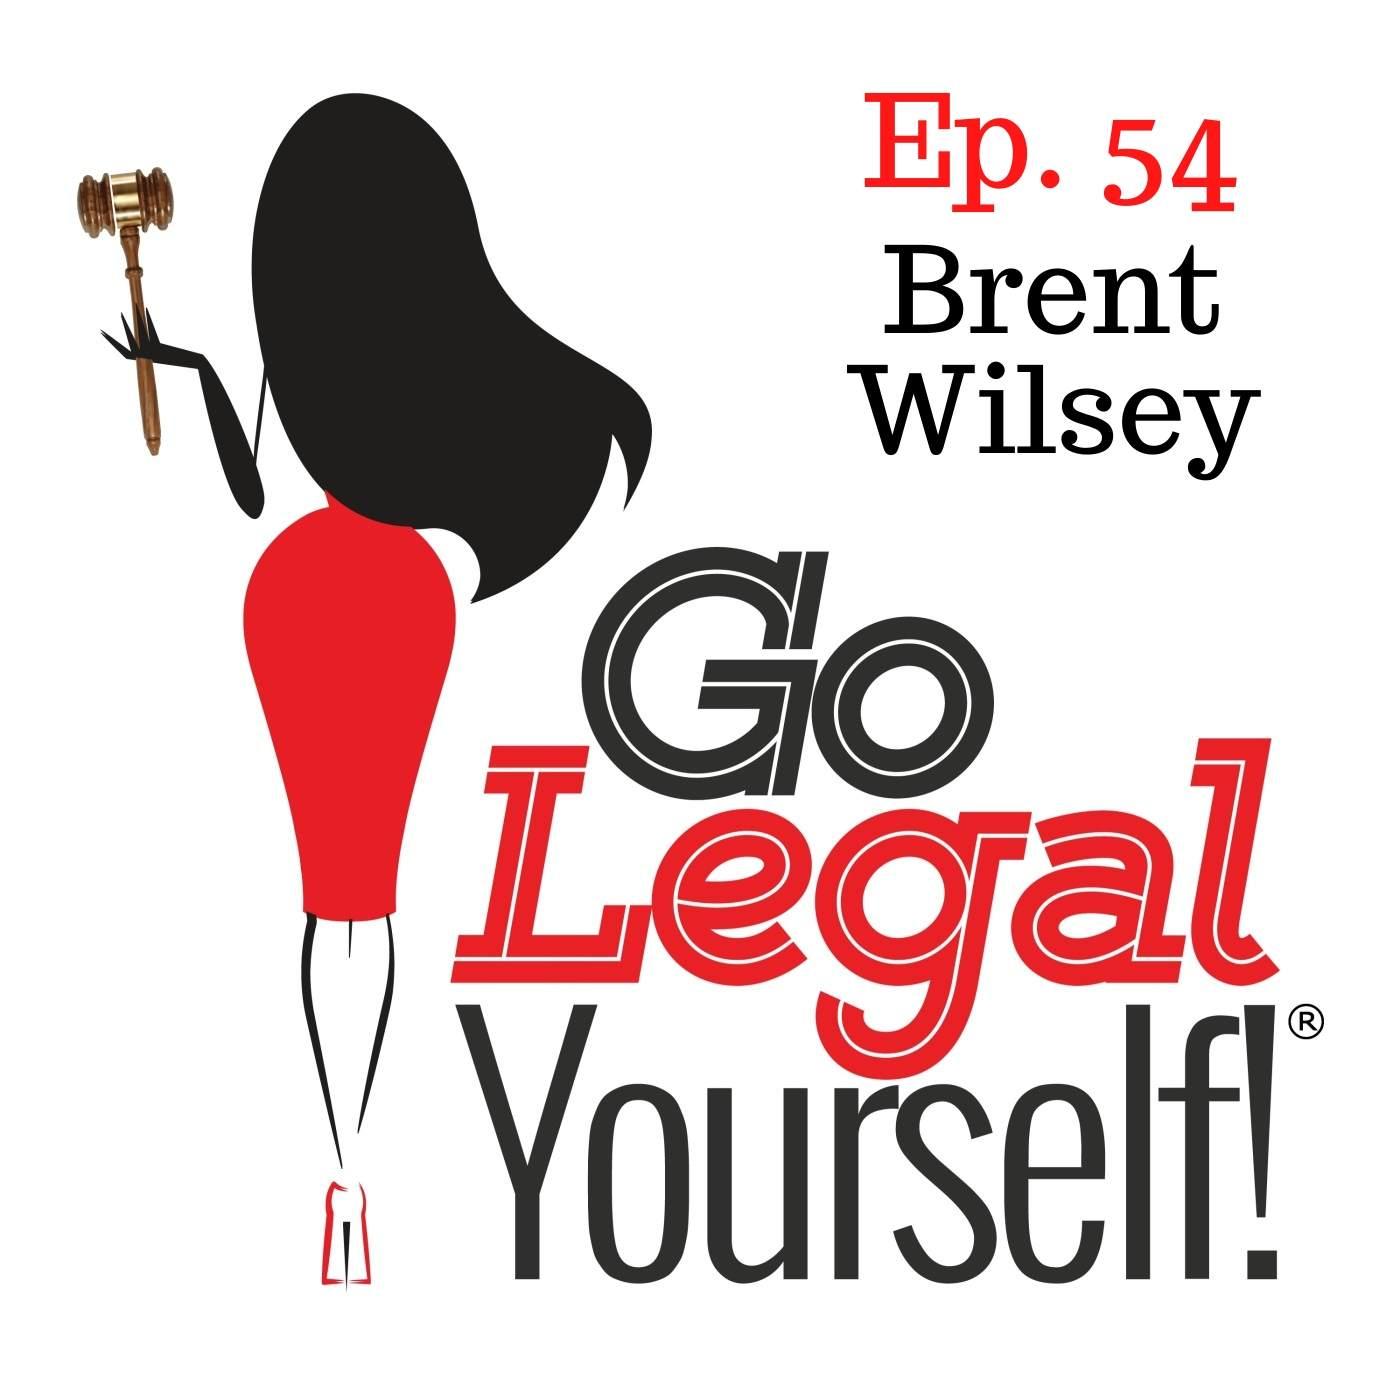 Ep. 54 Brent Wilsey: Saving Money